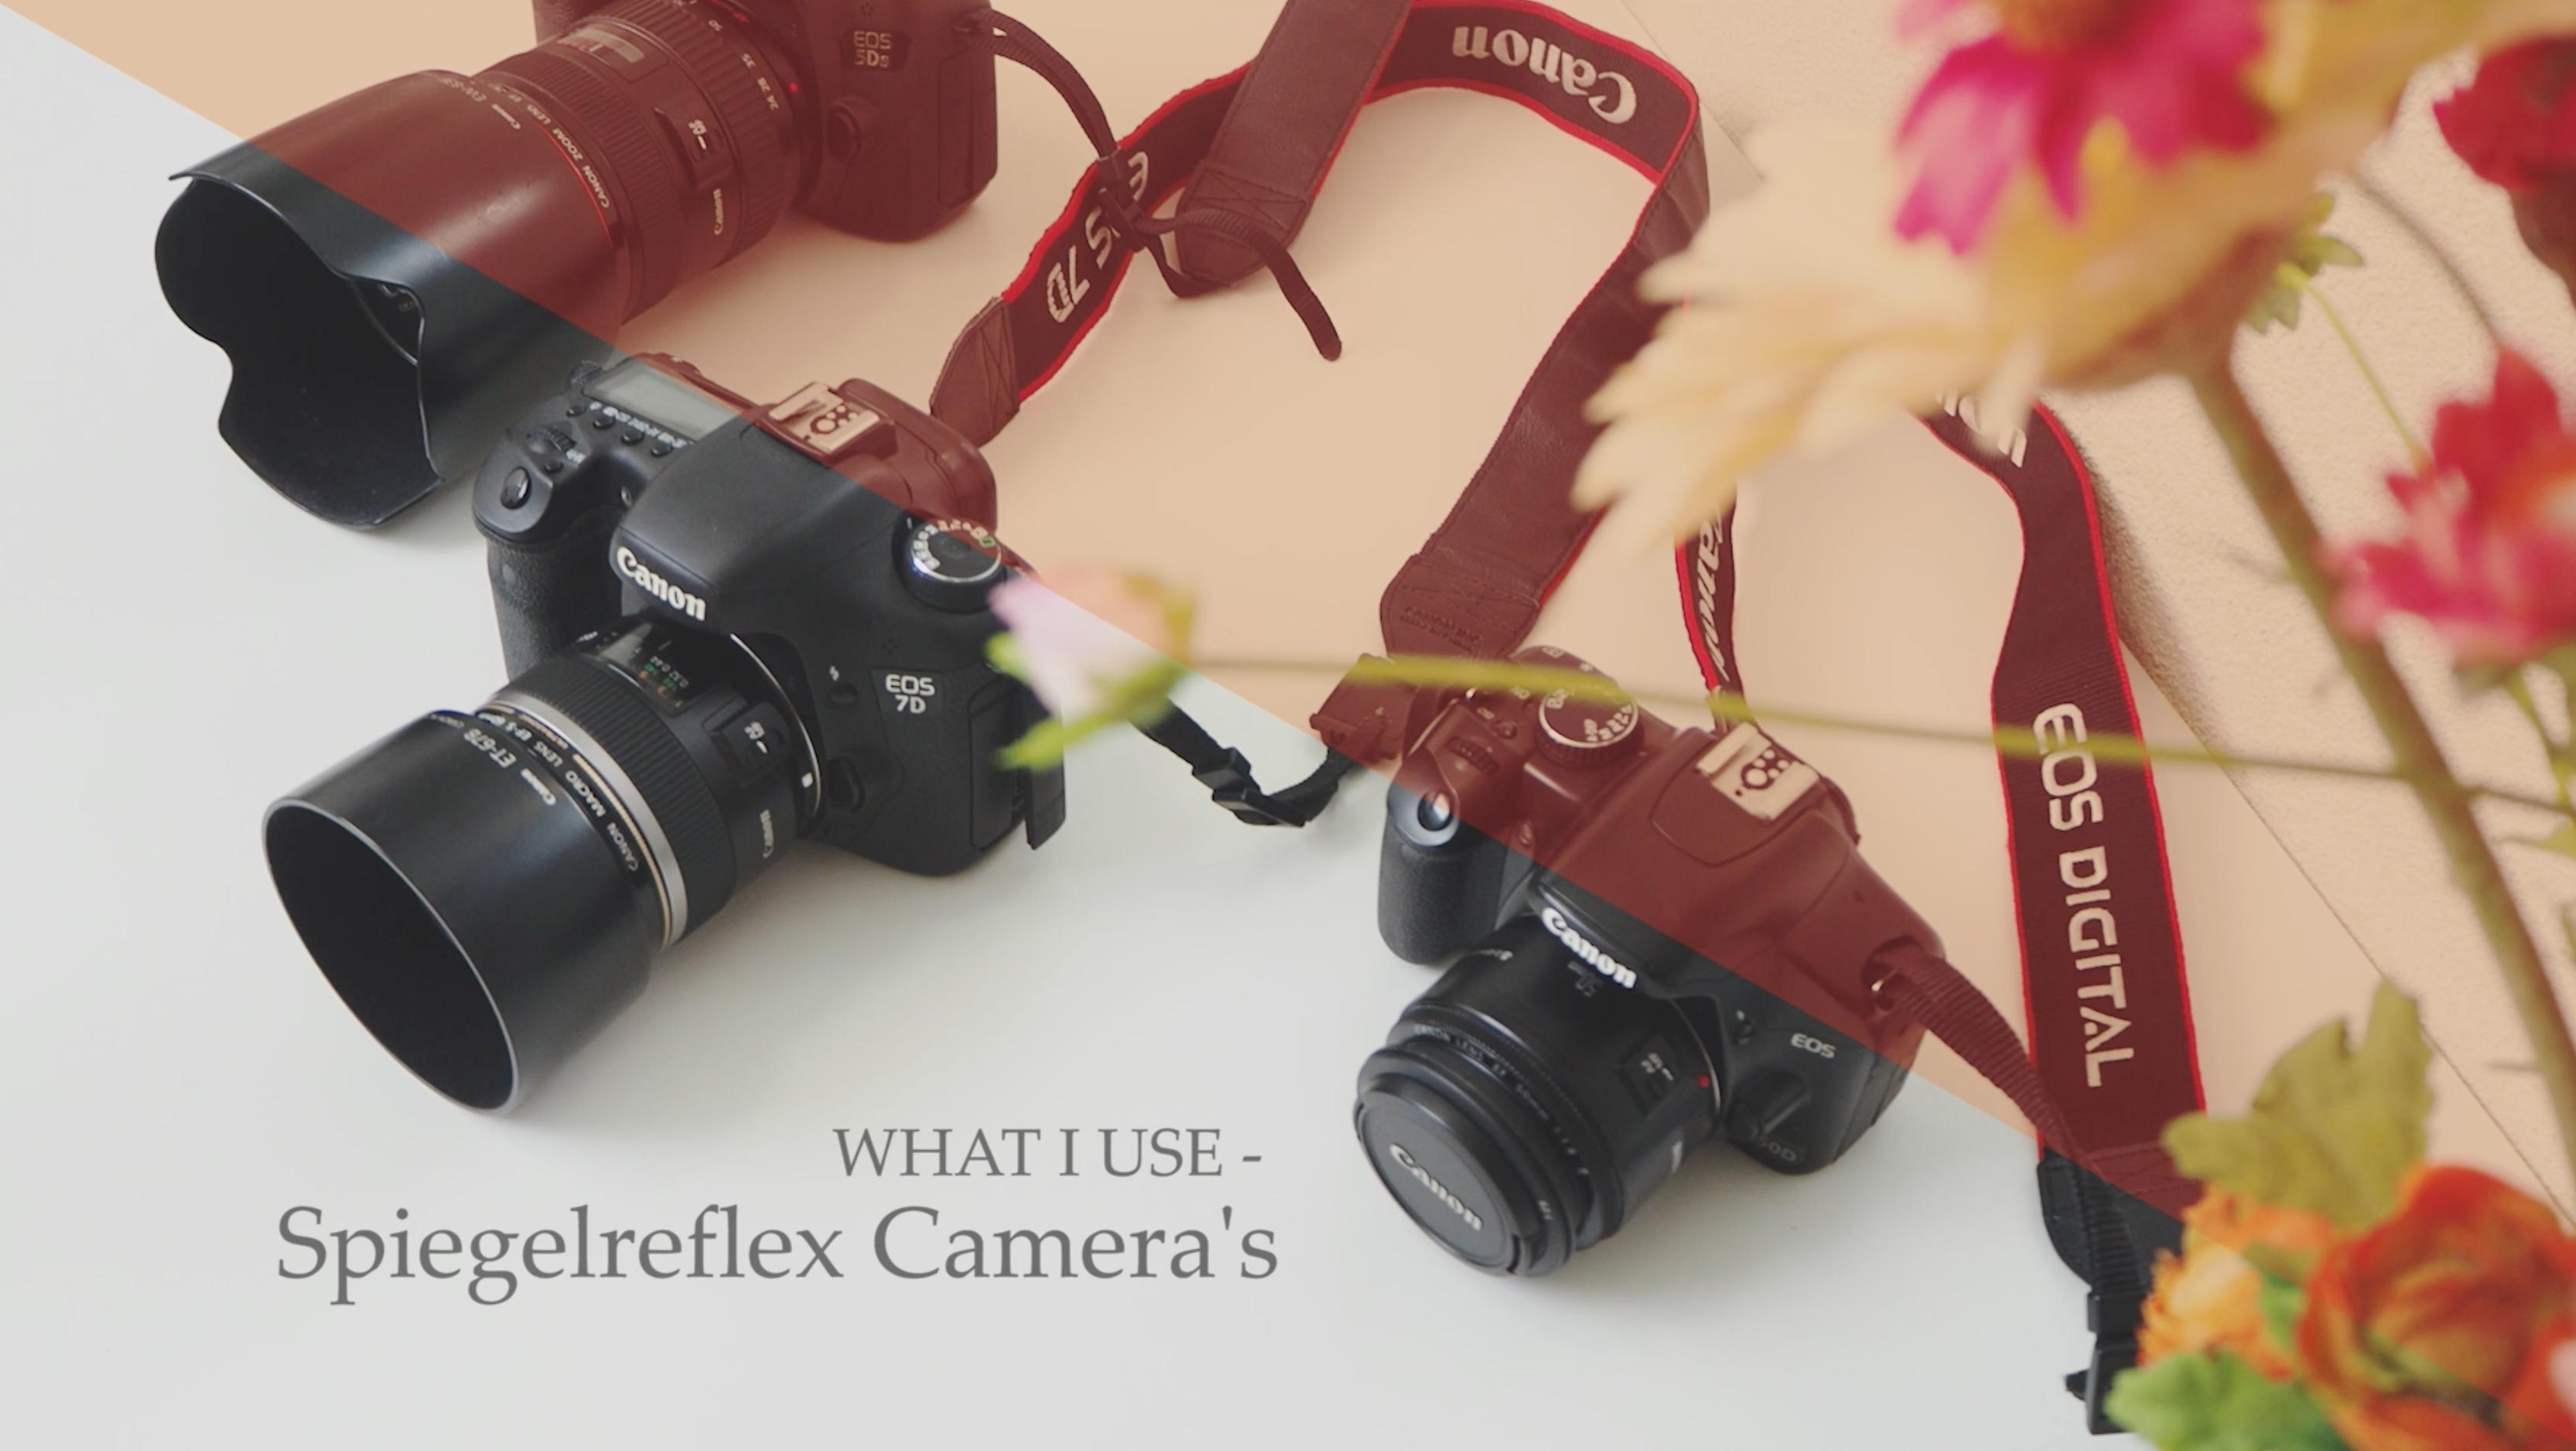 WHAT I USE –  Spiegelreflex, welke camera heb ik?